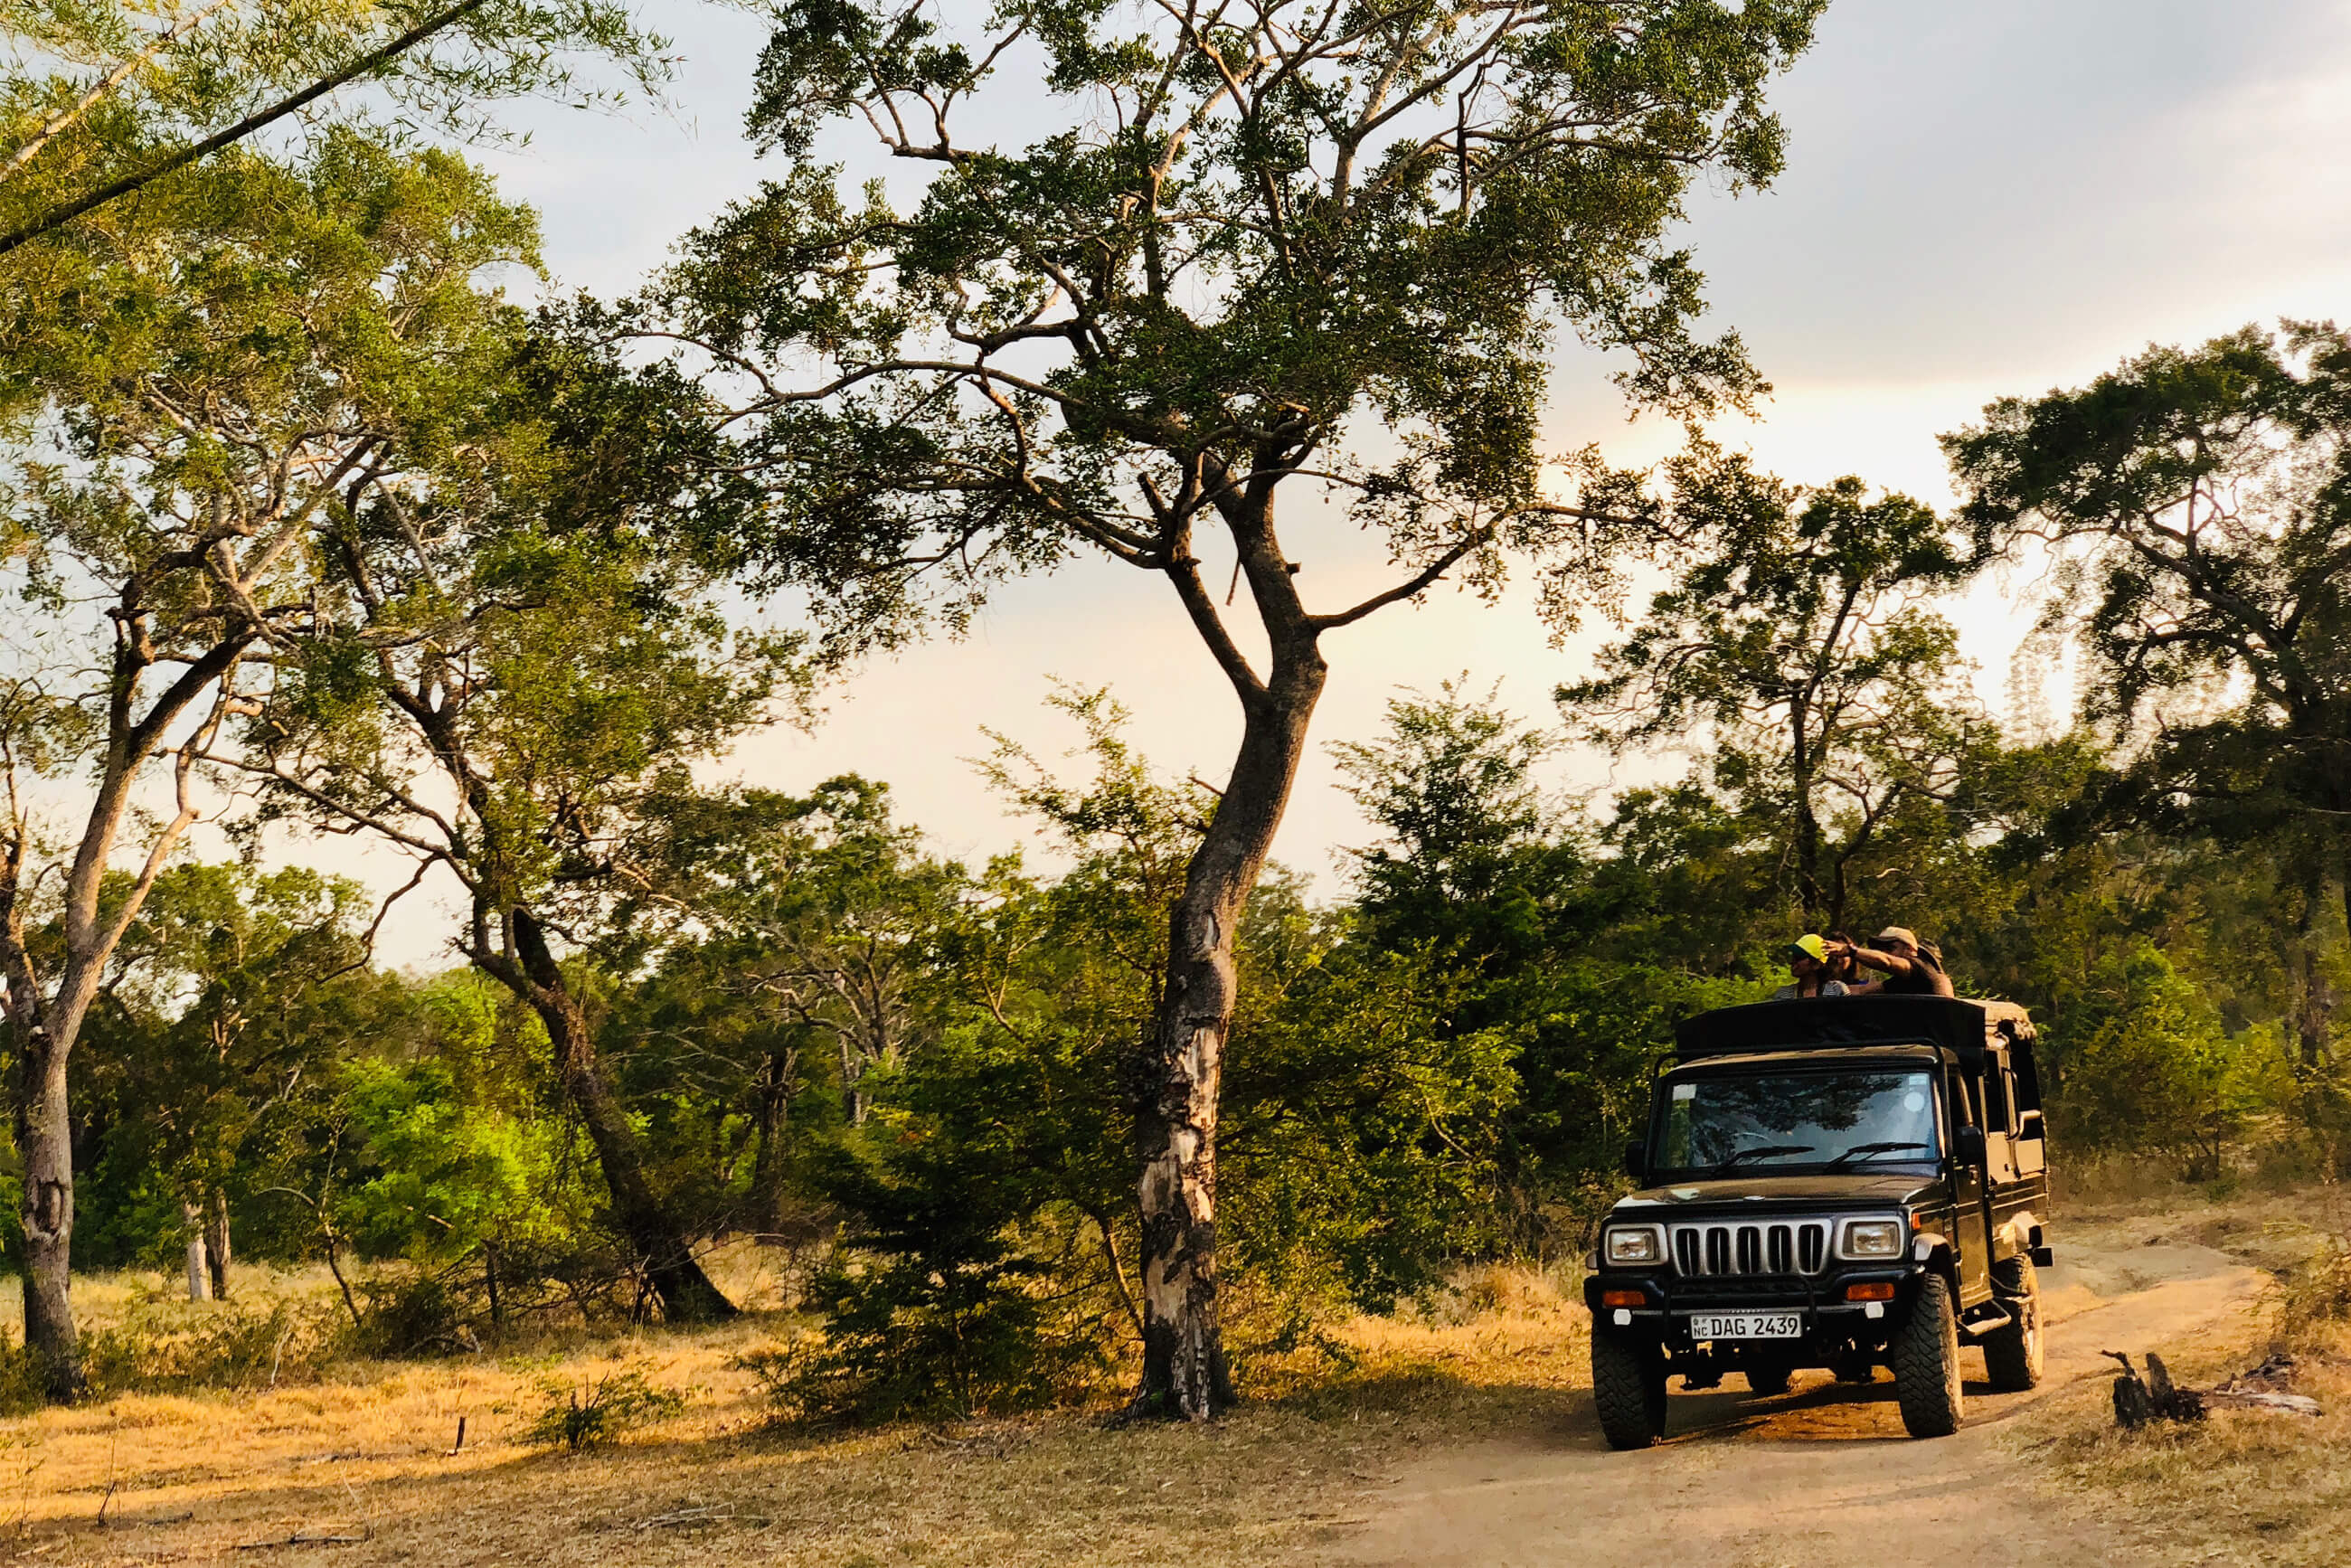 https://bubo.sk/uploads/galleries/7327/robert_taraba_srilanka_safari2.jpg